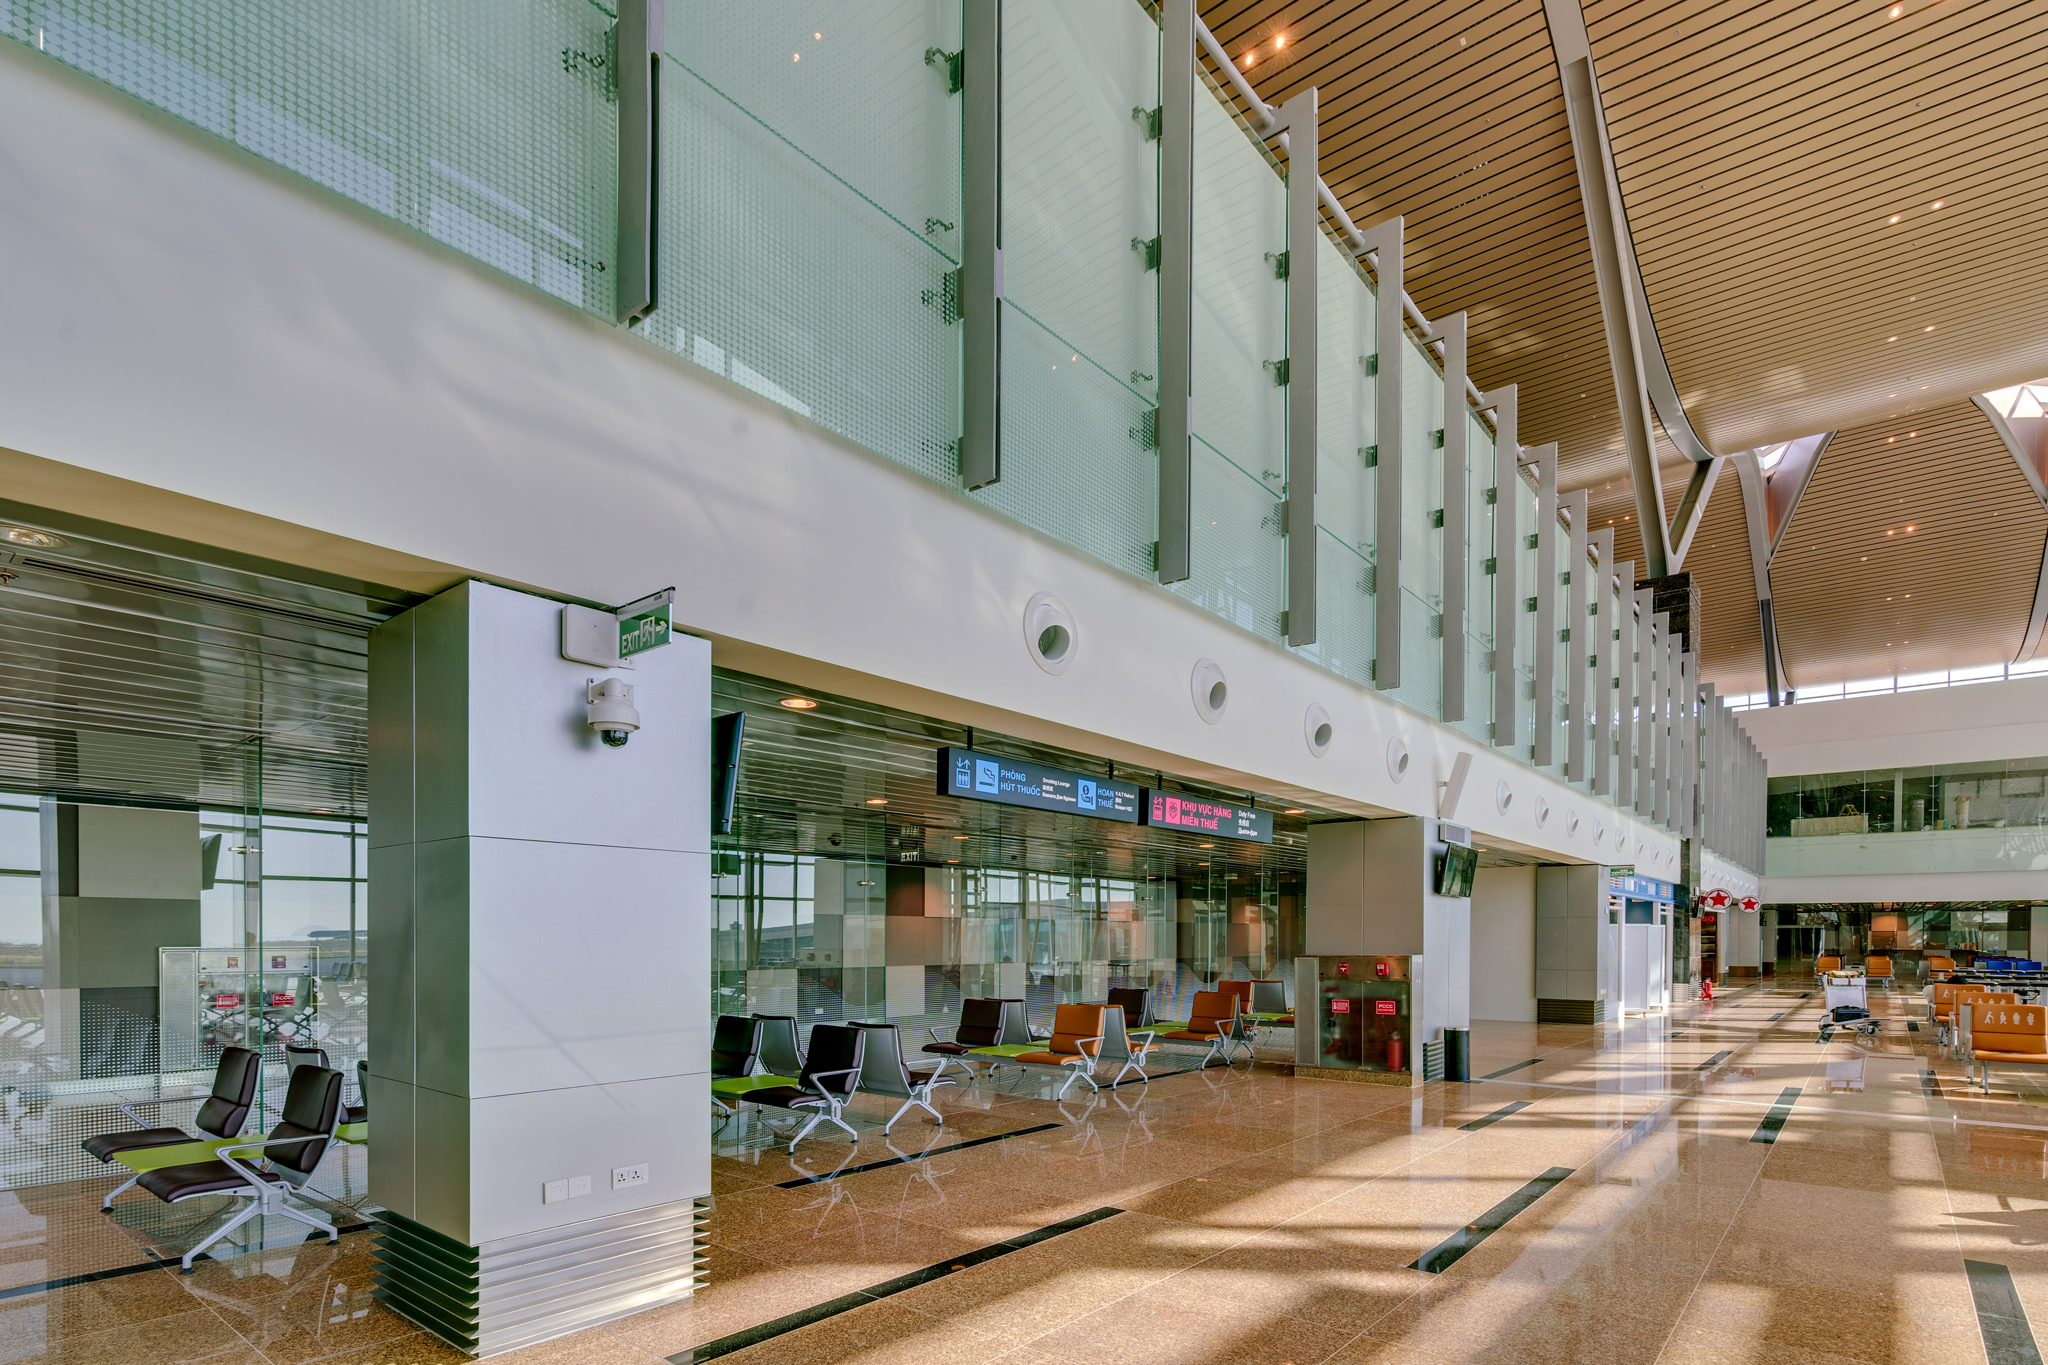 20180626 - Cam Ranh Airport - Architecture - 0185.jpg